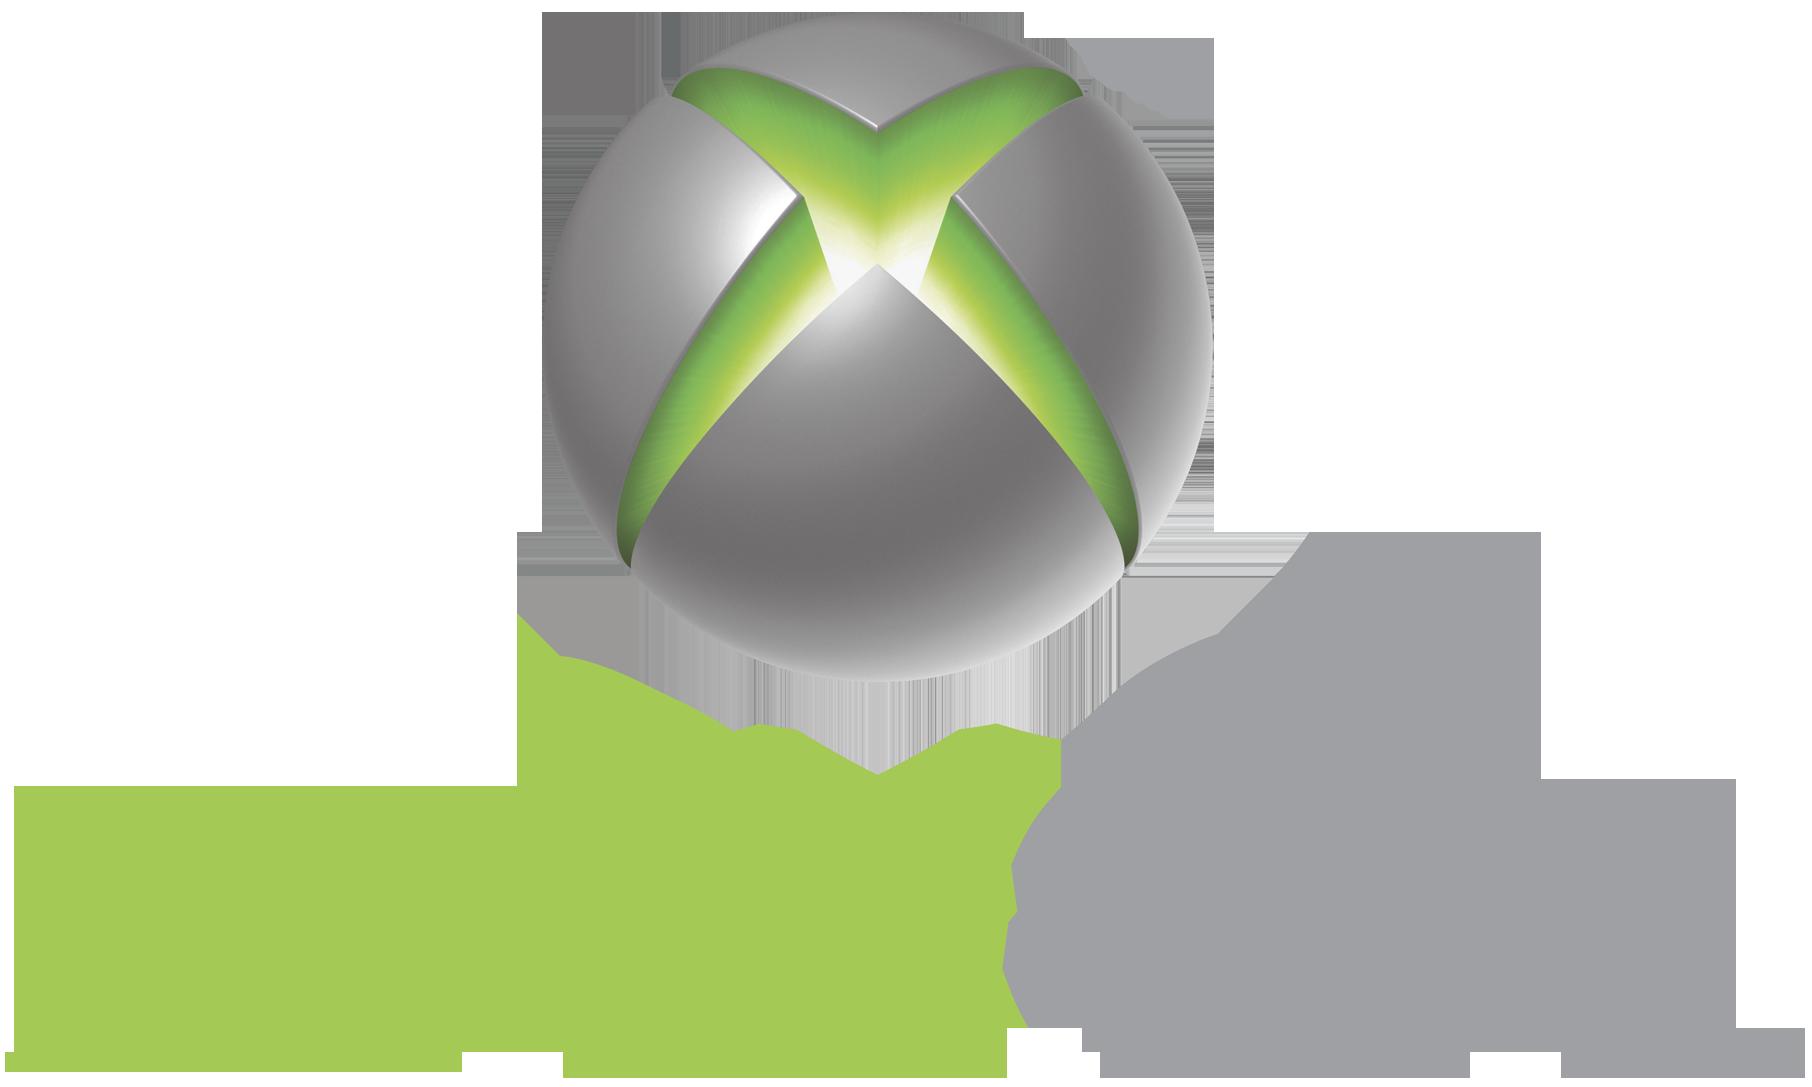 Xbox Logo Logo Png Transparent Download Famous Logos Xbox 360 Xbox Microsoft